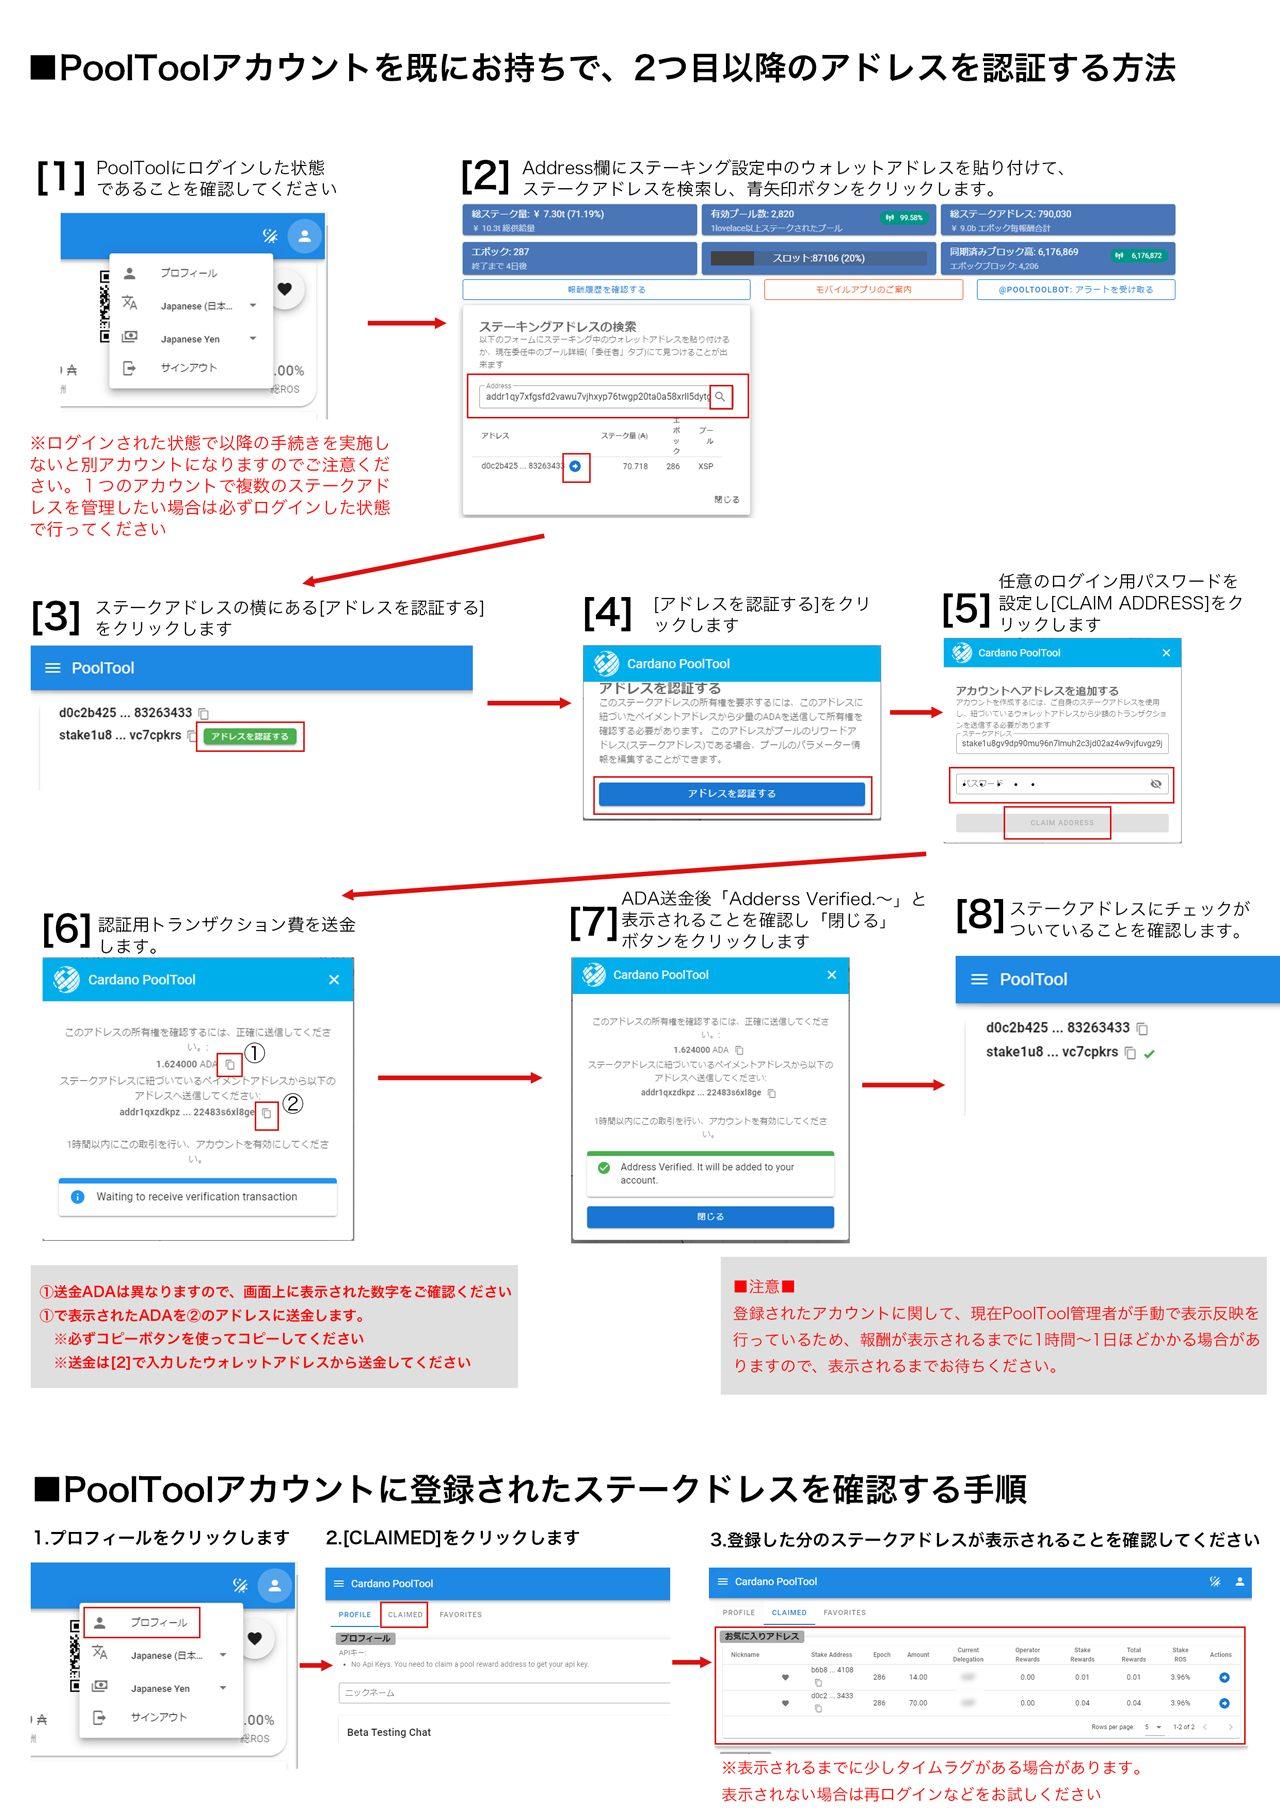 PoolTool2つ目以降のステークアドレス登録手順